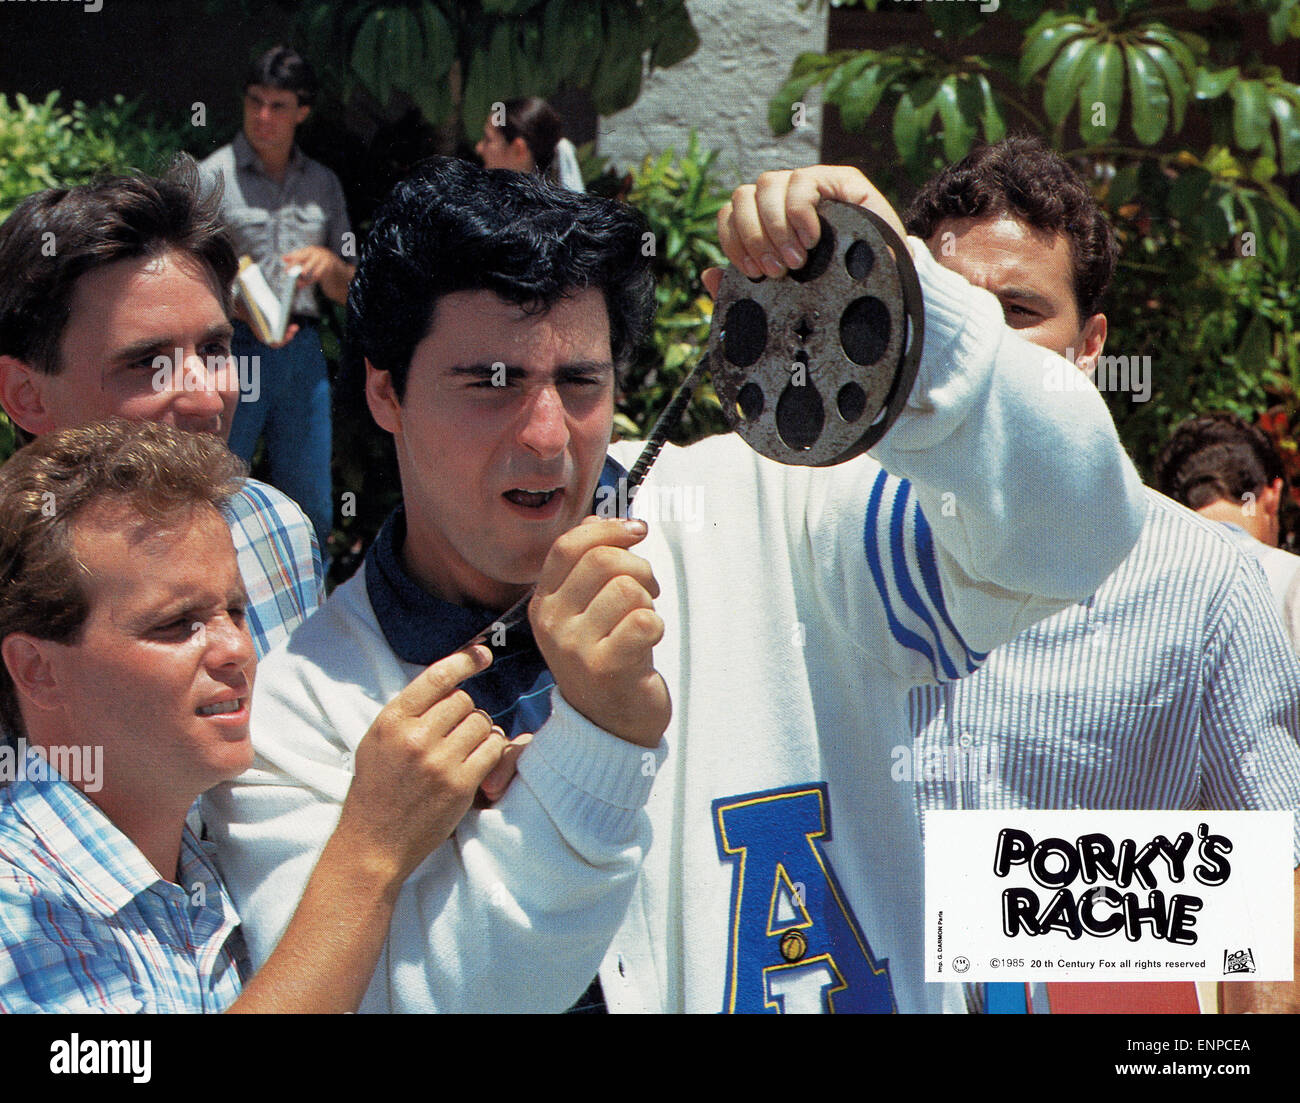 porkys 3 full movie download